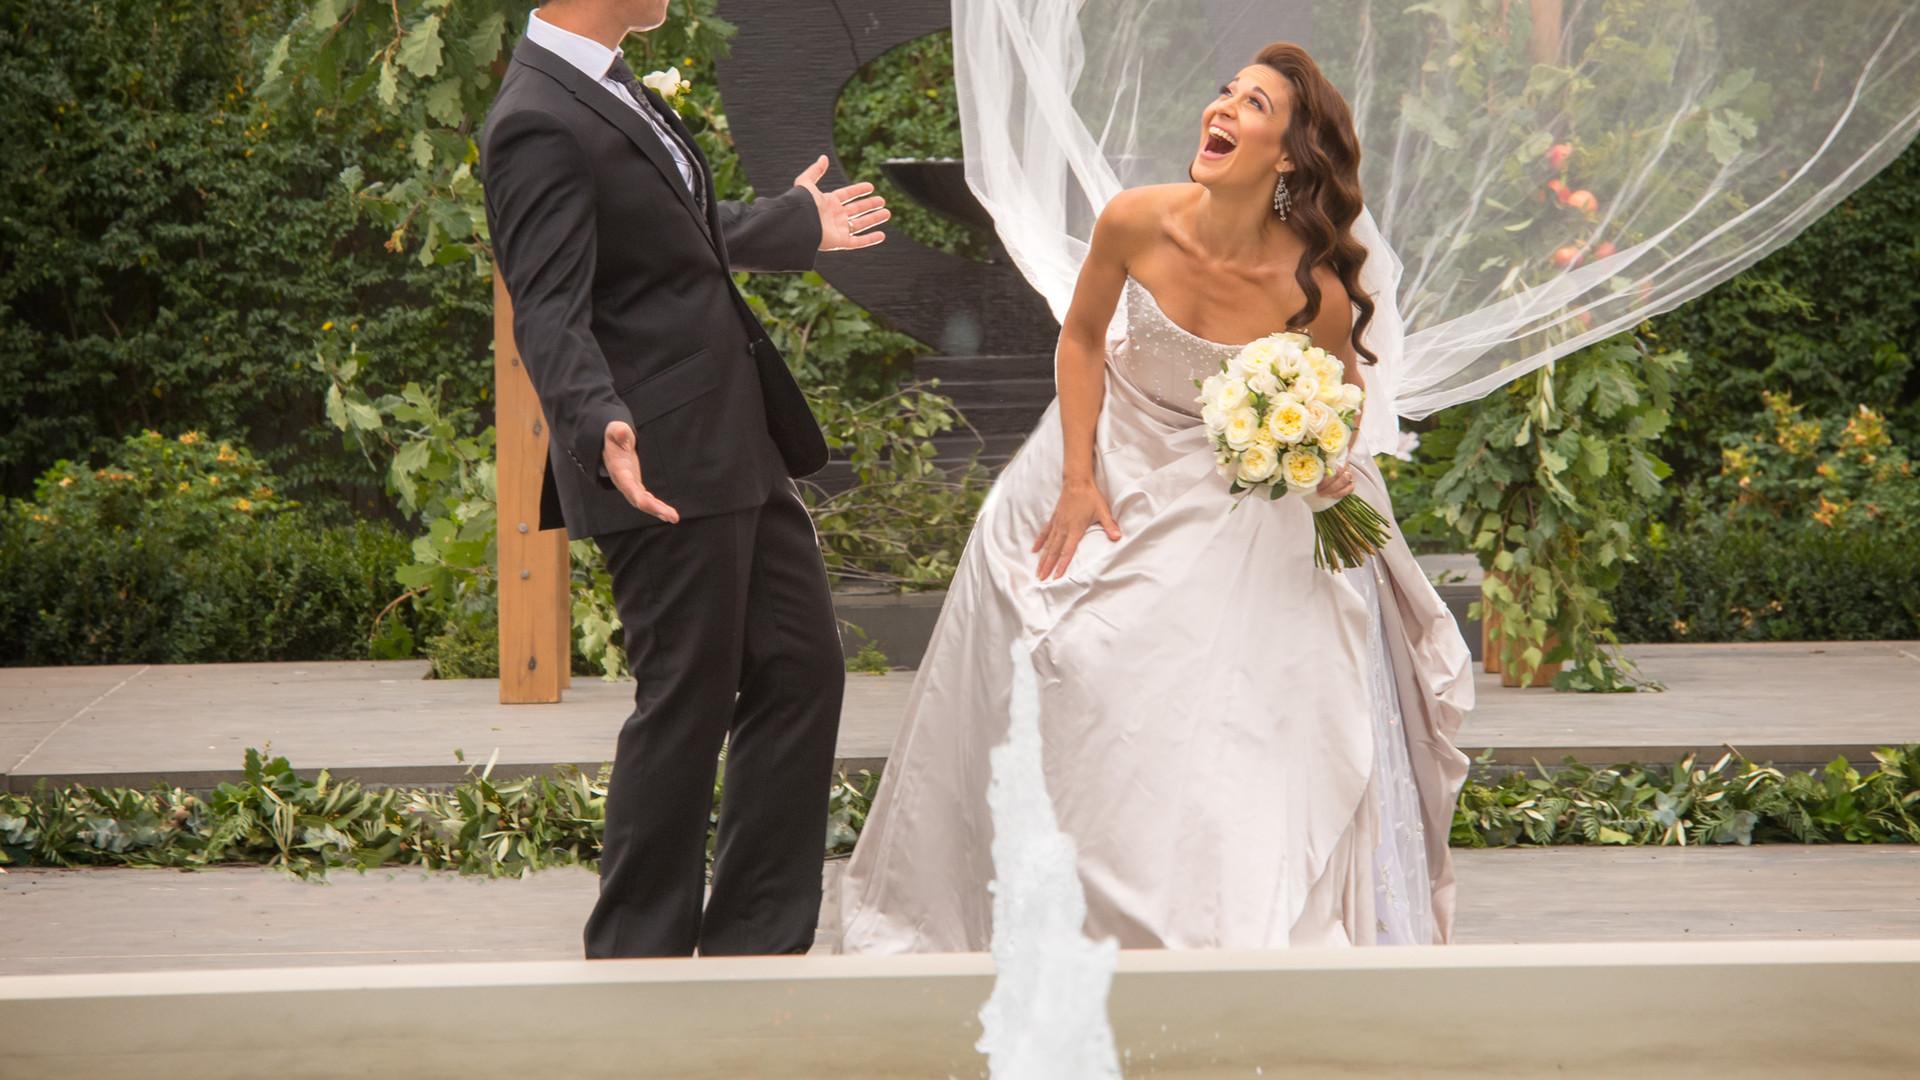 Laughing Bride and Groom | Meadowbank Estate | Wedding Venue | Campbellfield